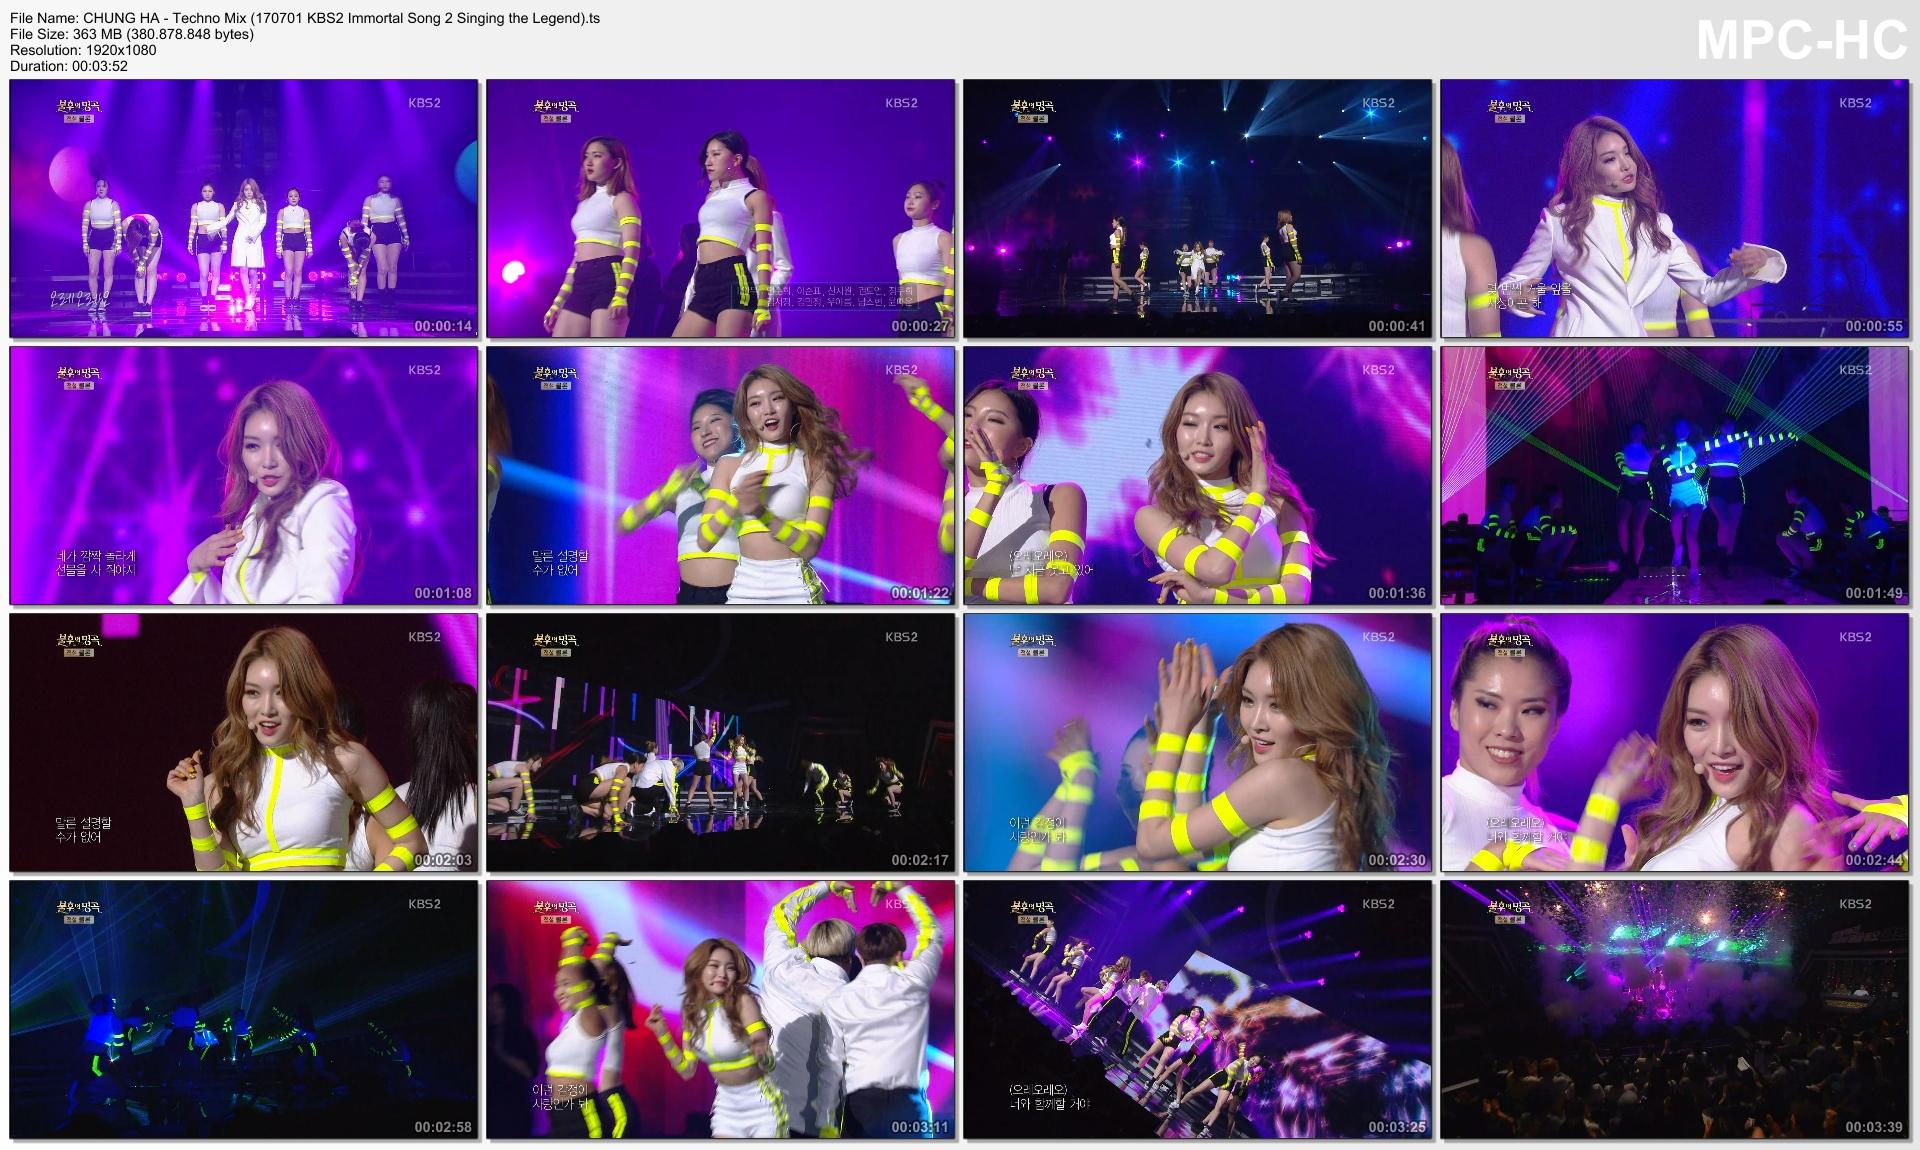 Other] - [Google Drive] Chung Ha, Seventeen (170701 KBS2 Immortal